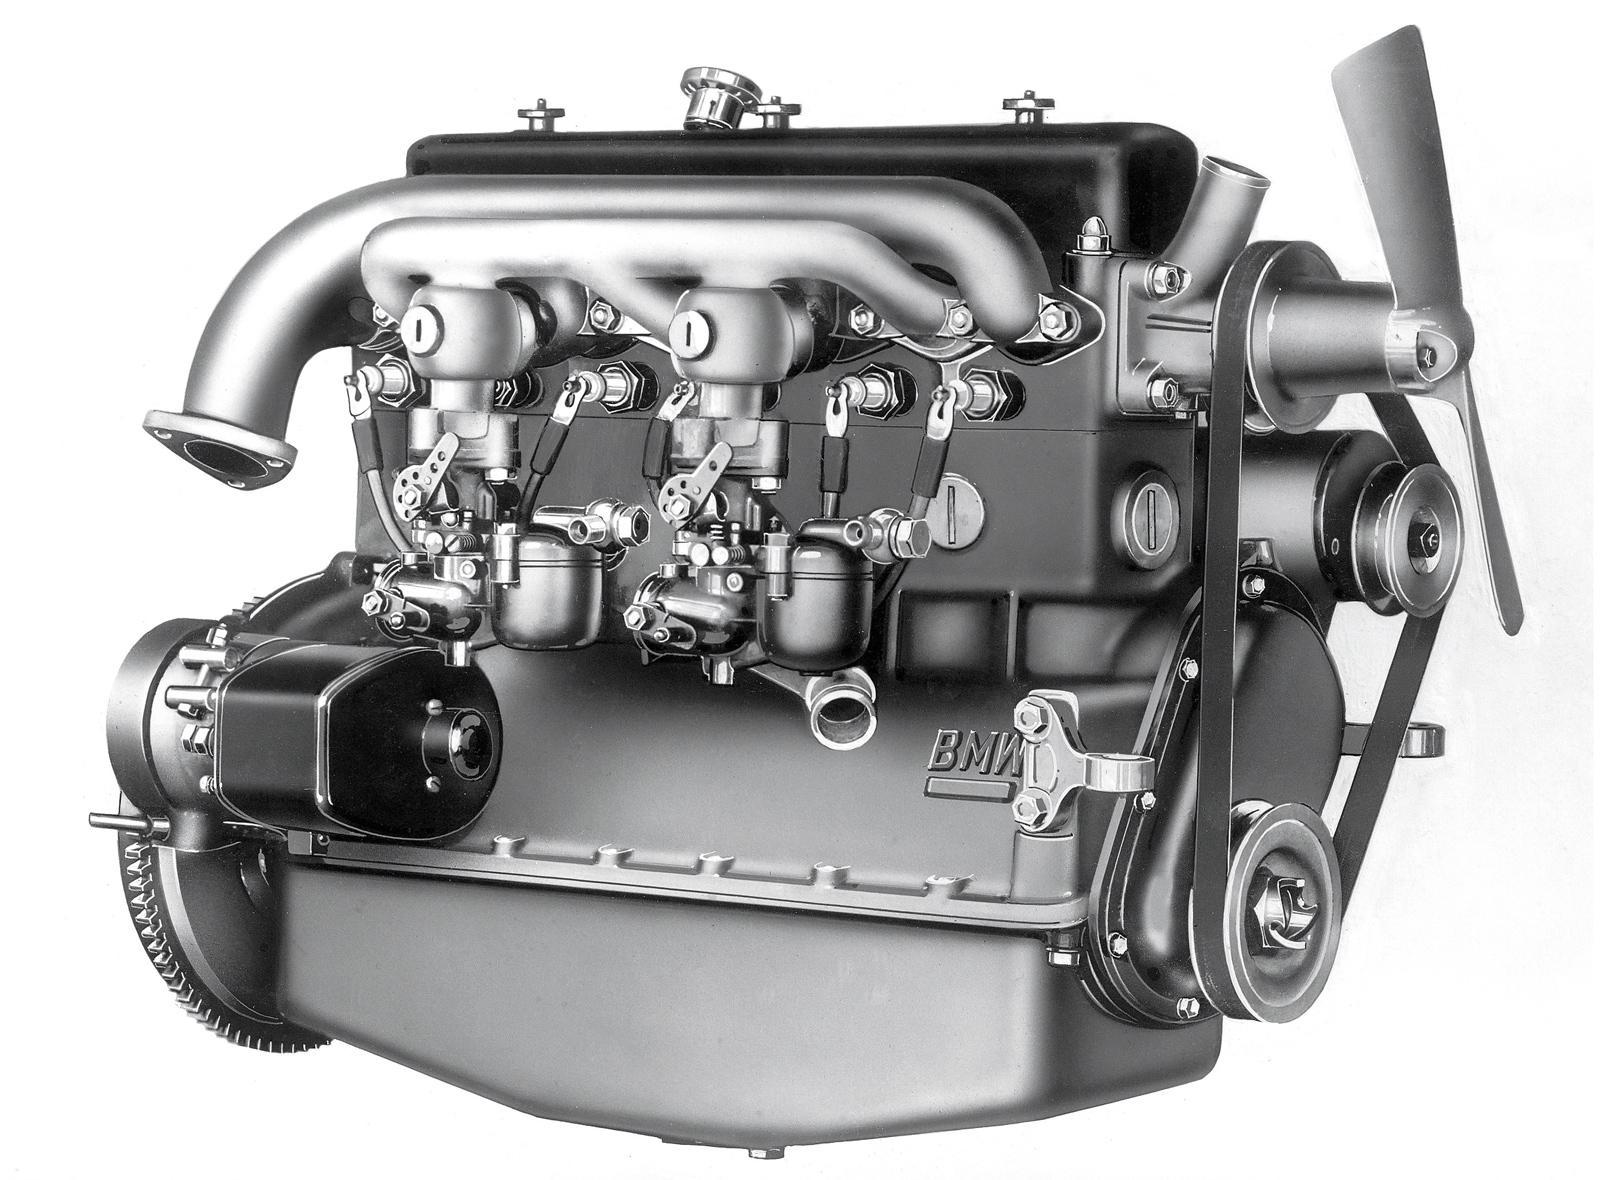 BMW 303 Motor